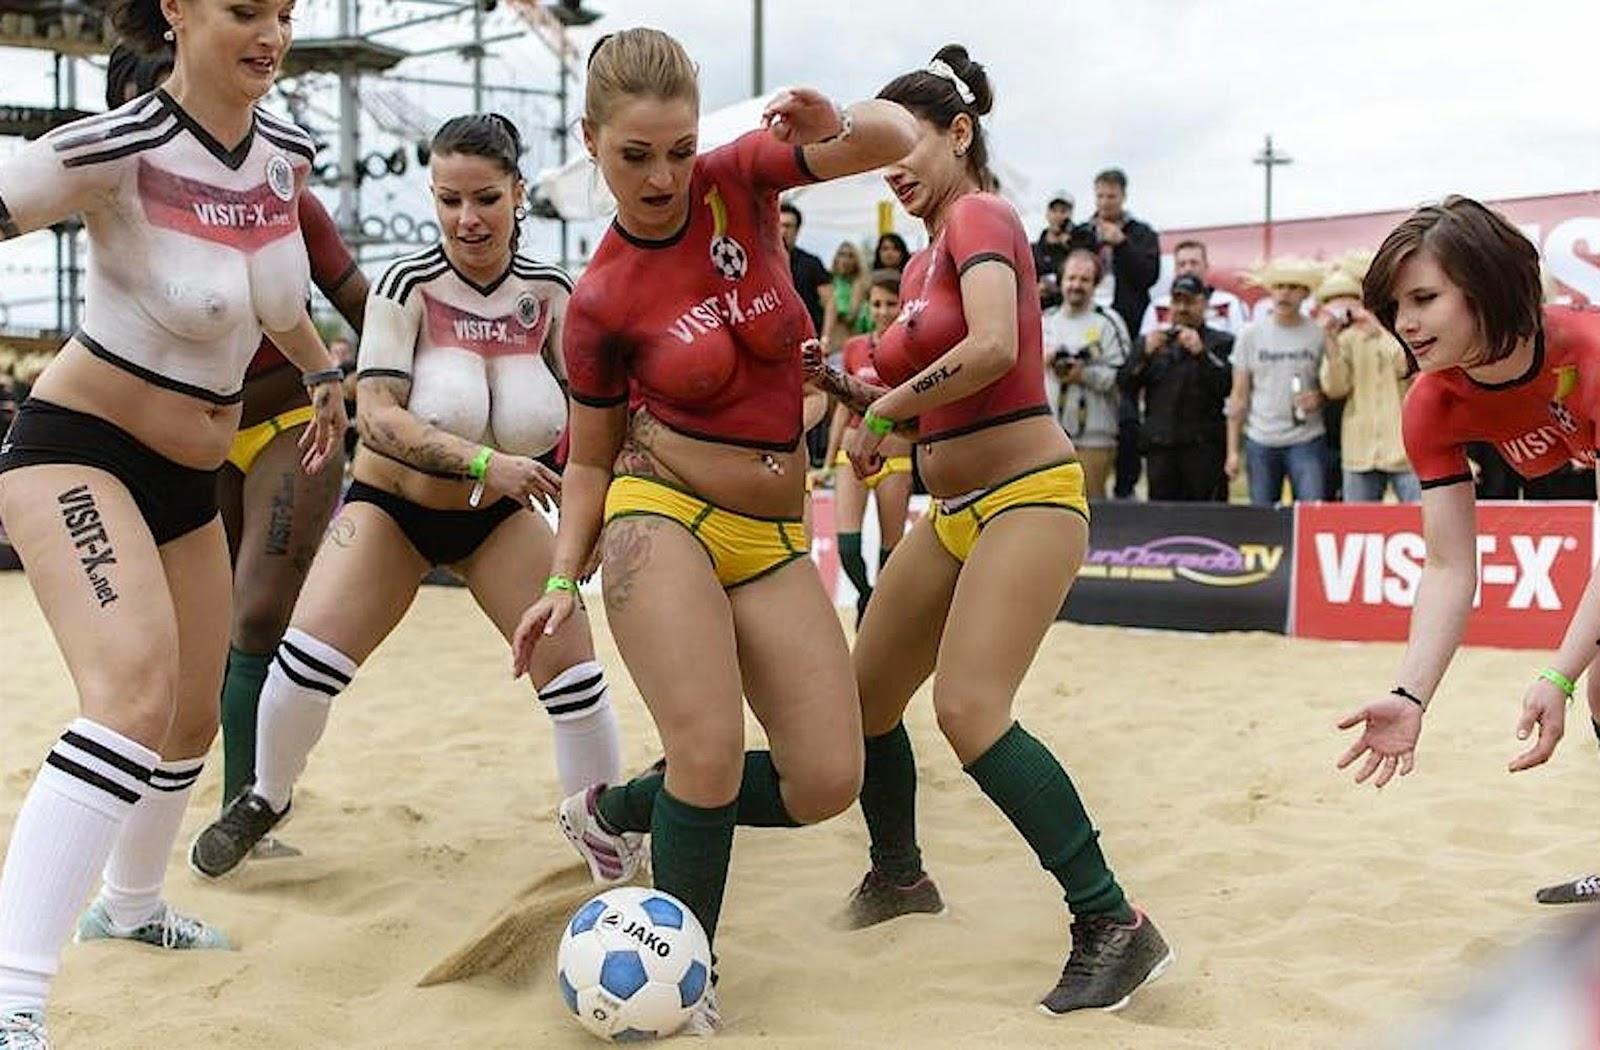 Смотреть чемпионат мира по сексу, Чемпионат по сексу в Варшаве Seksualny rekord swiata 14 фотография